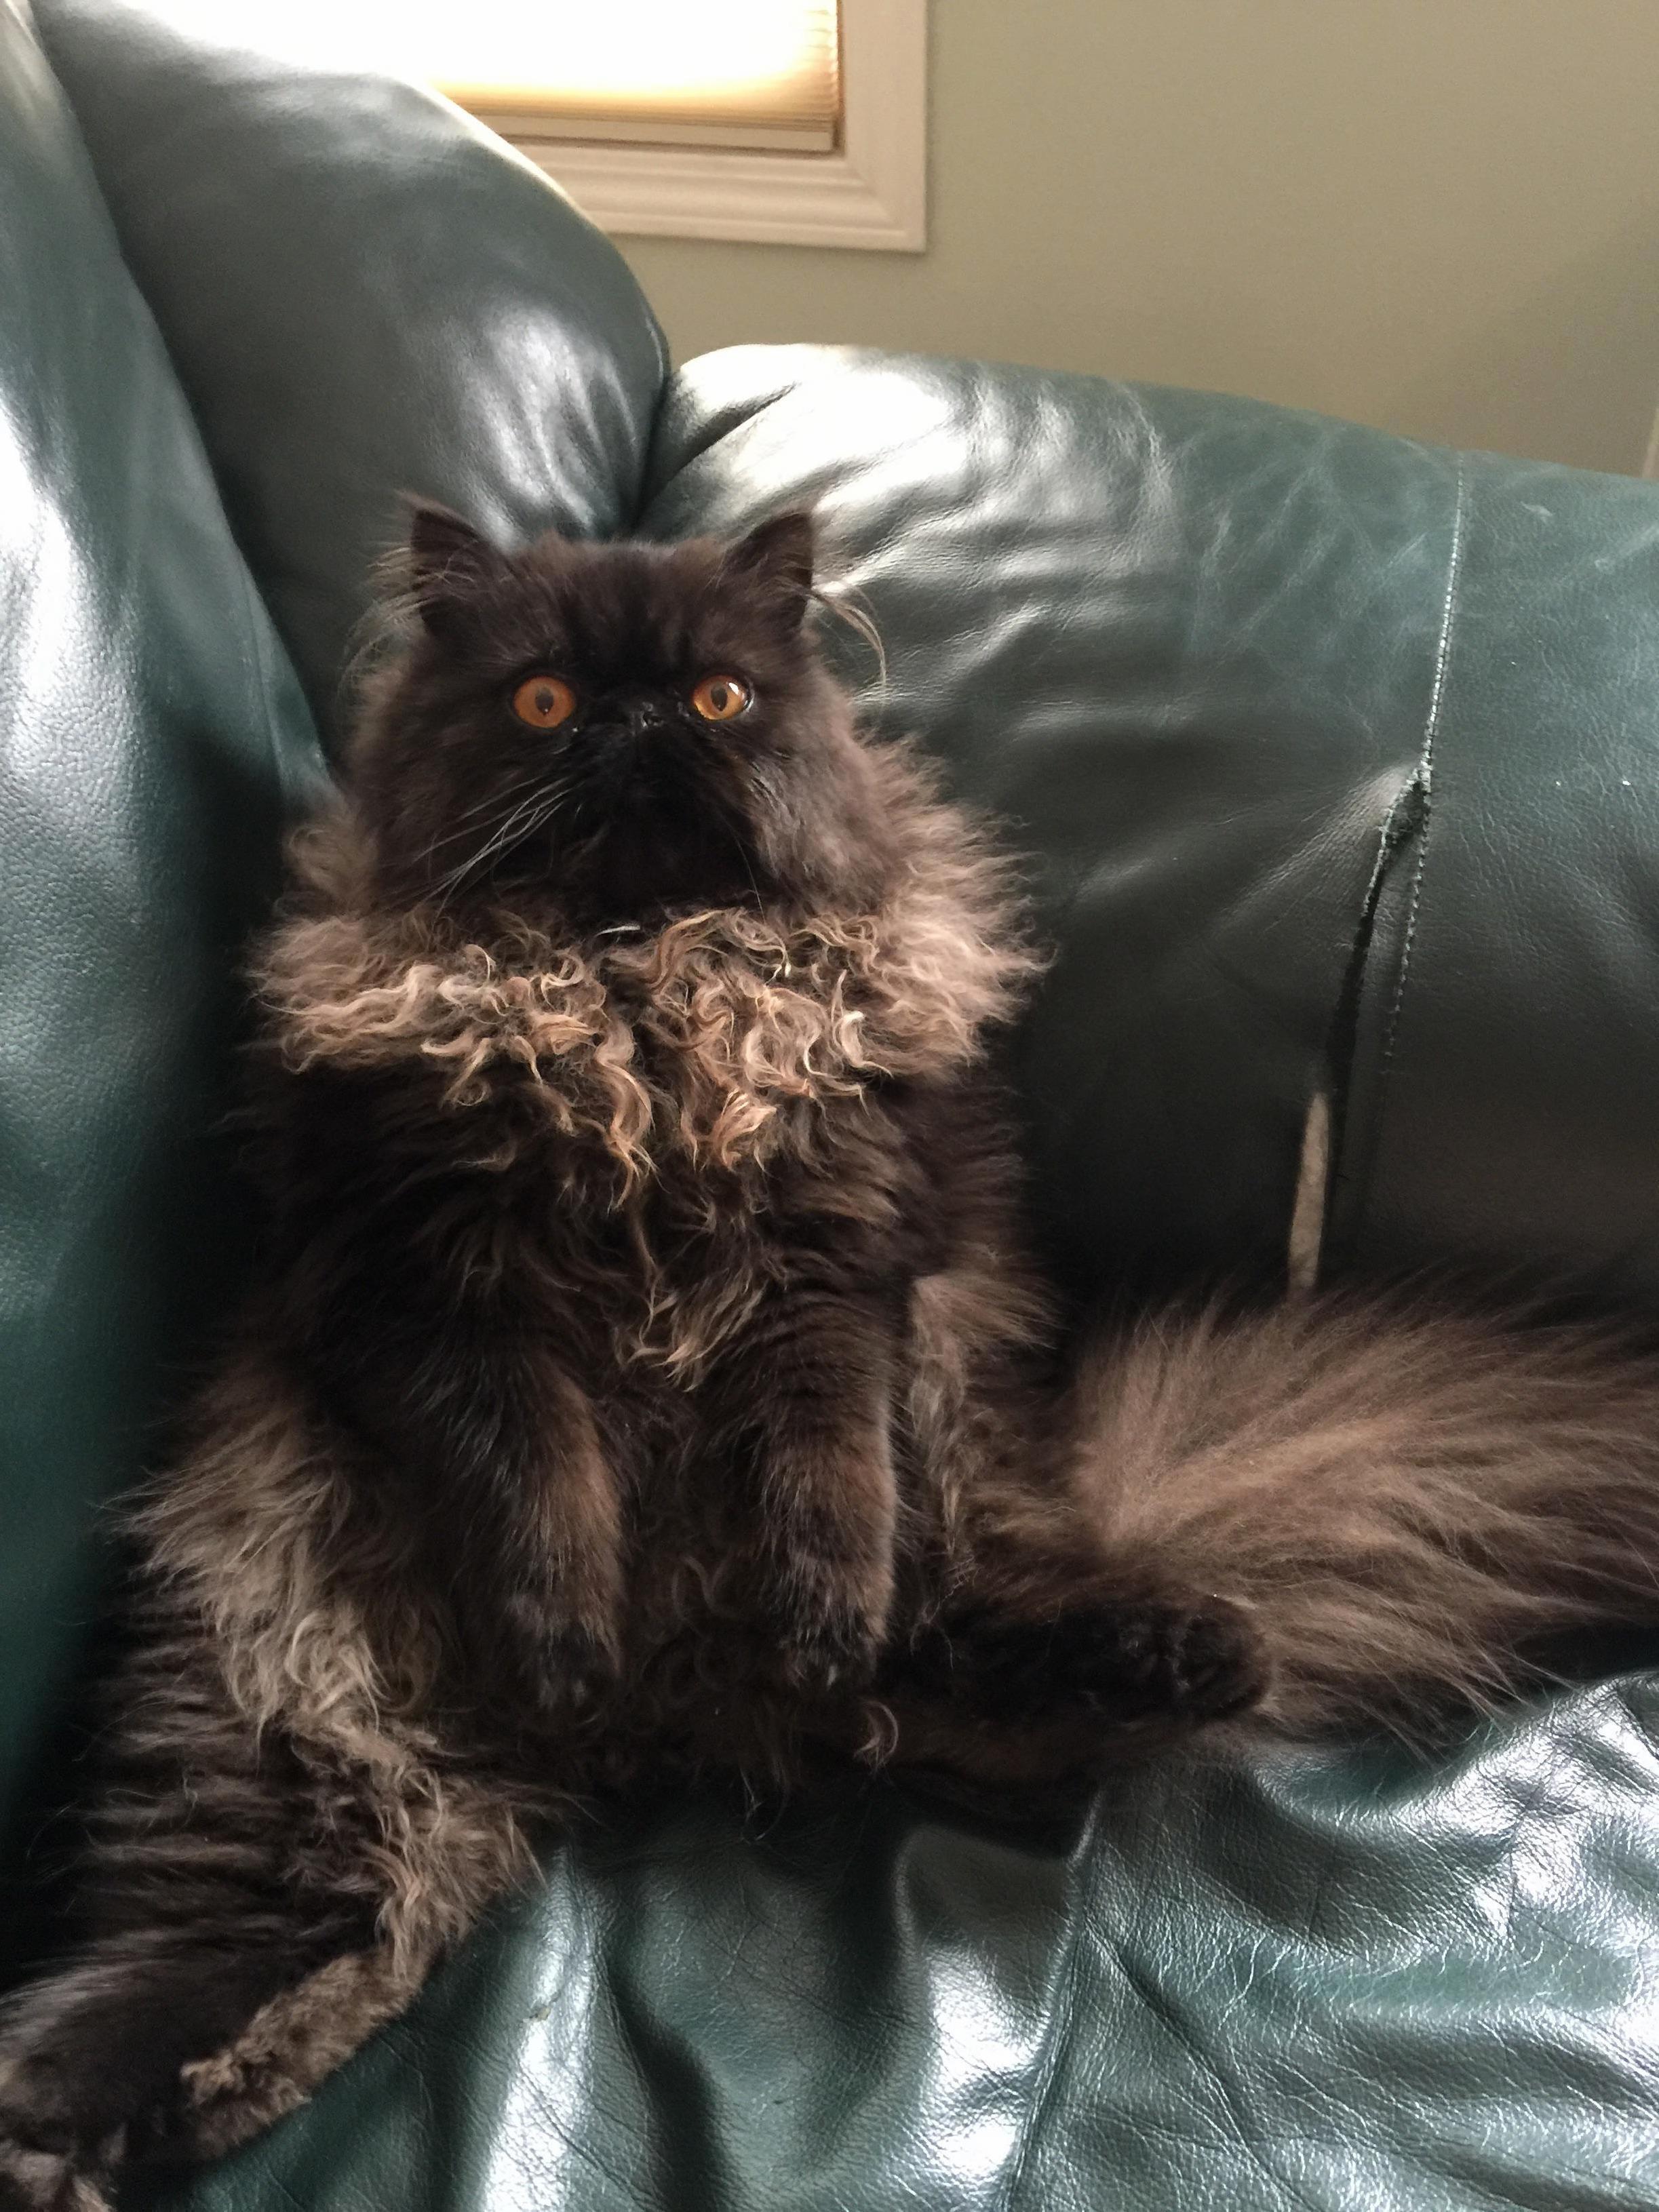 Bachelor cat